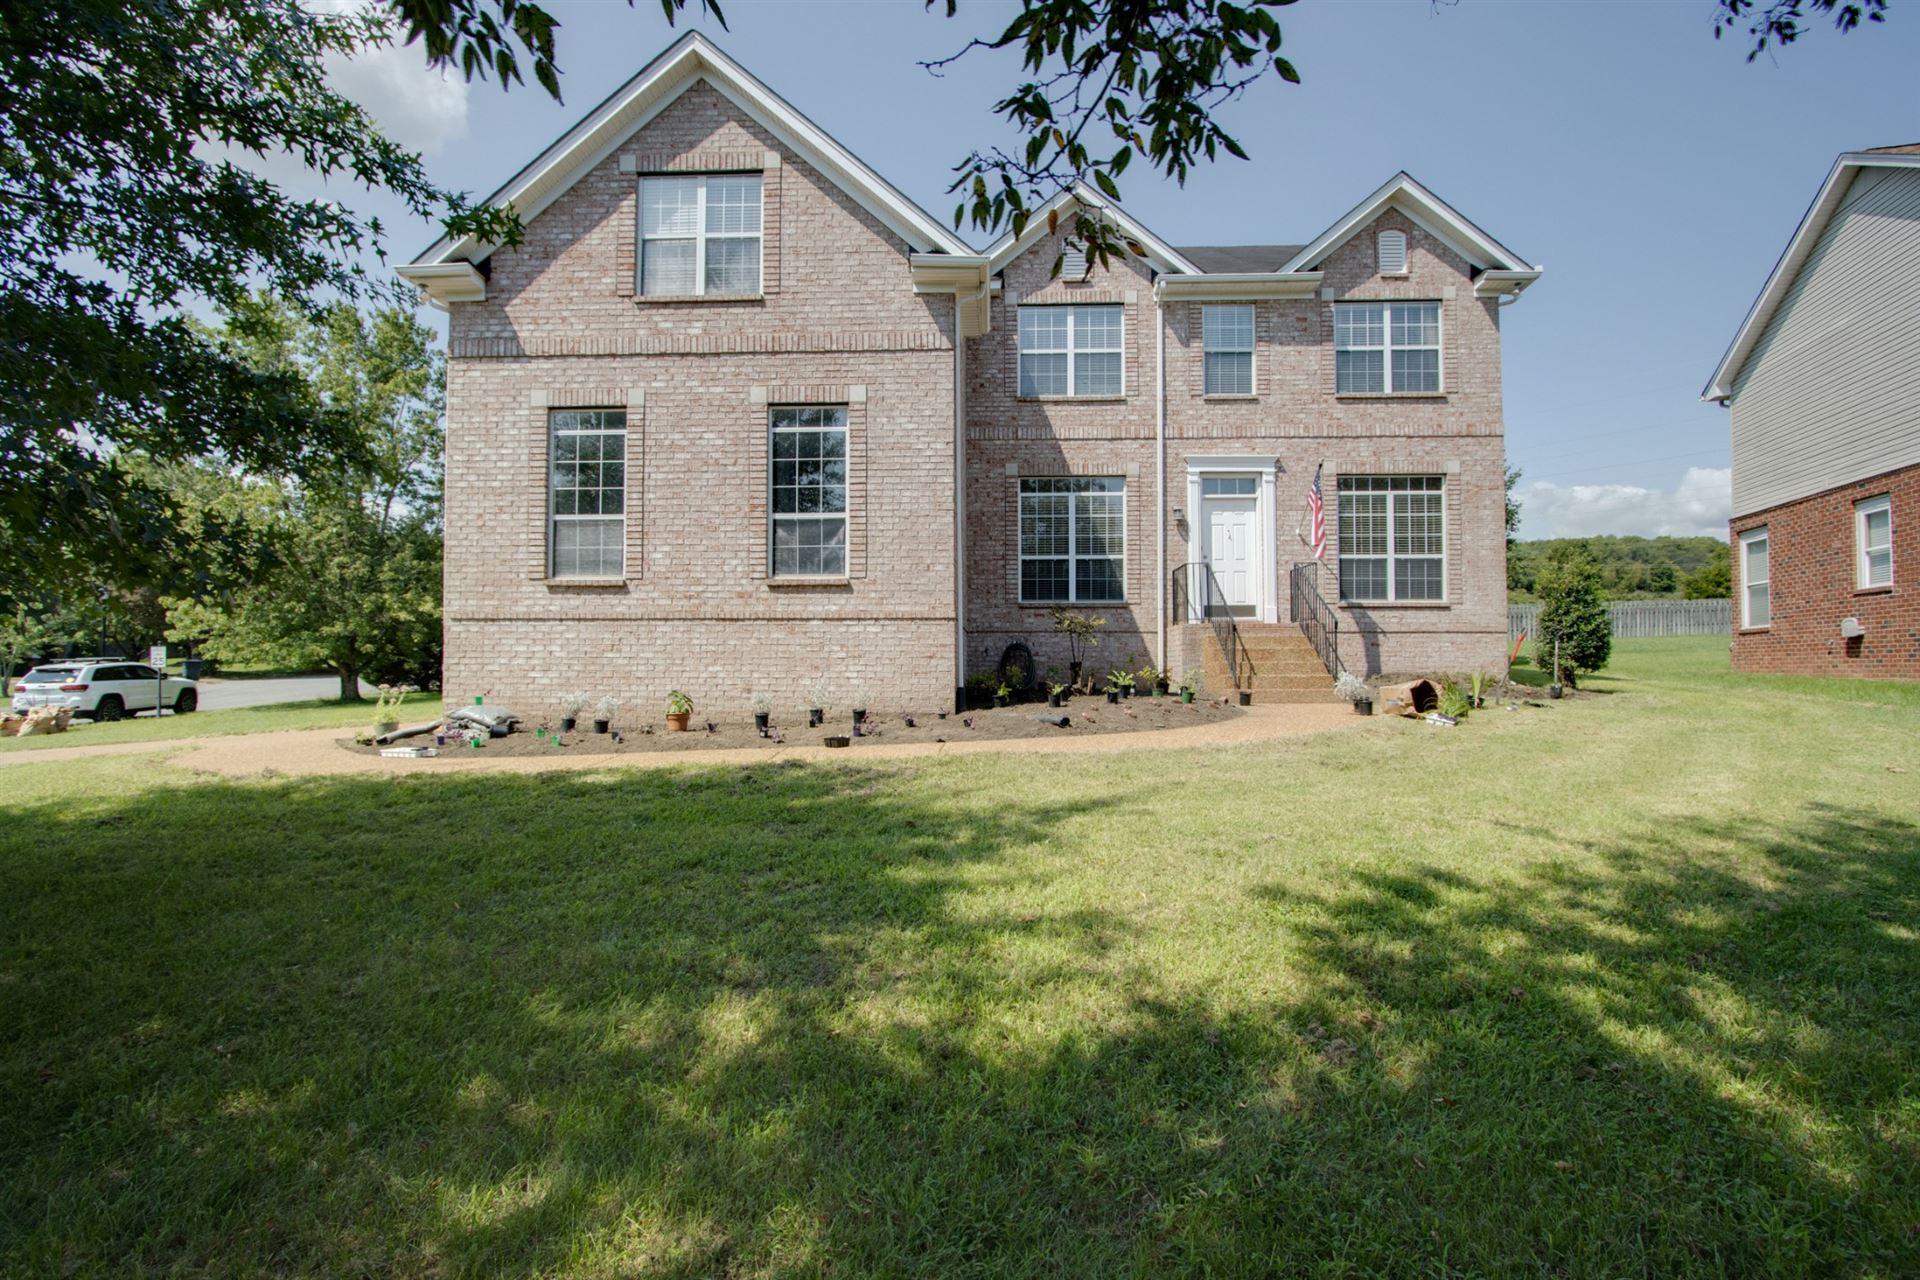 100 Camp Creek Ct, Hendersonville, TN 37075 - MLS#: 2288435